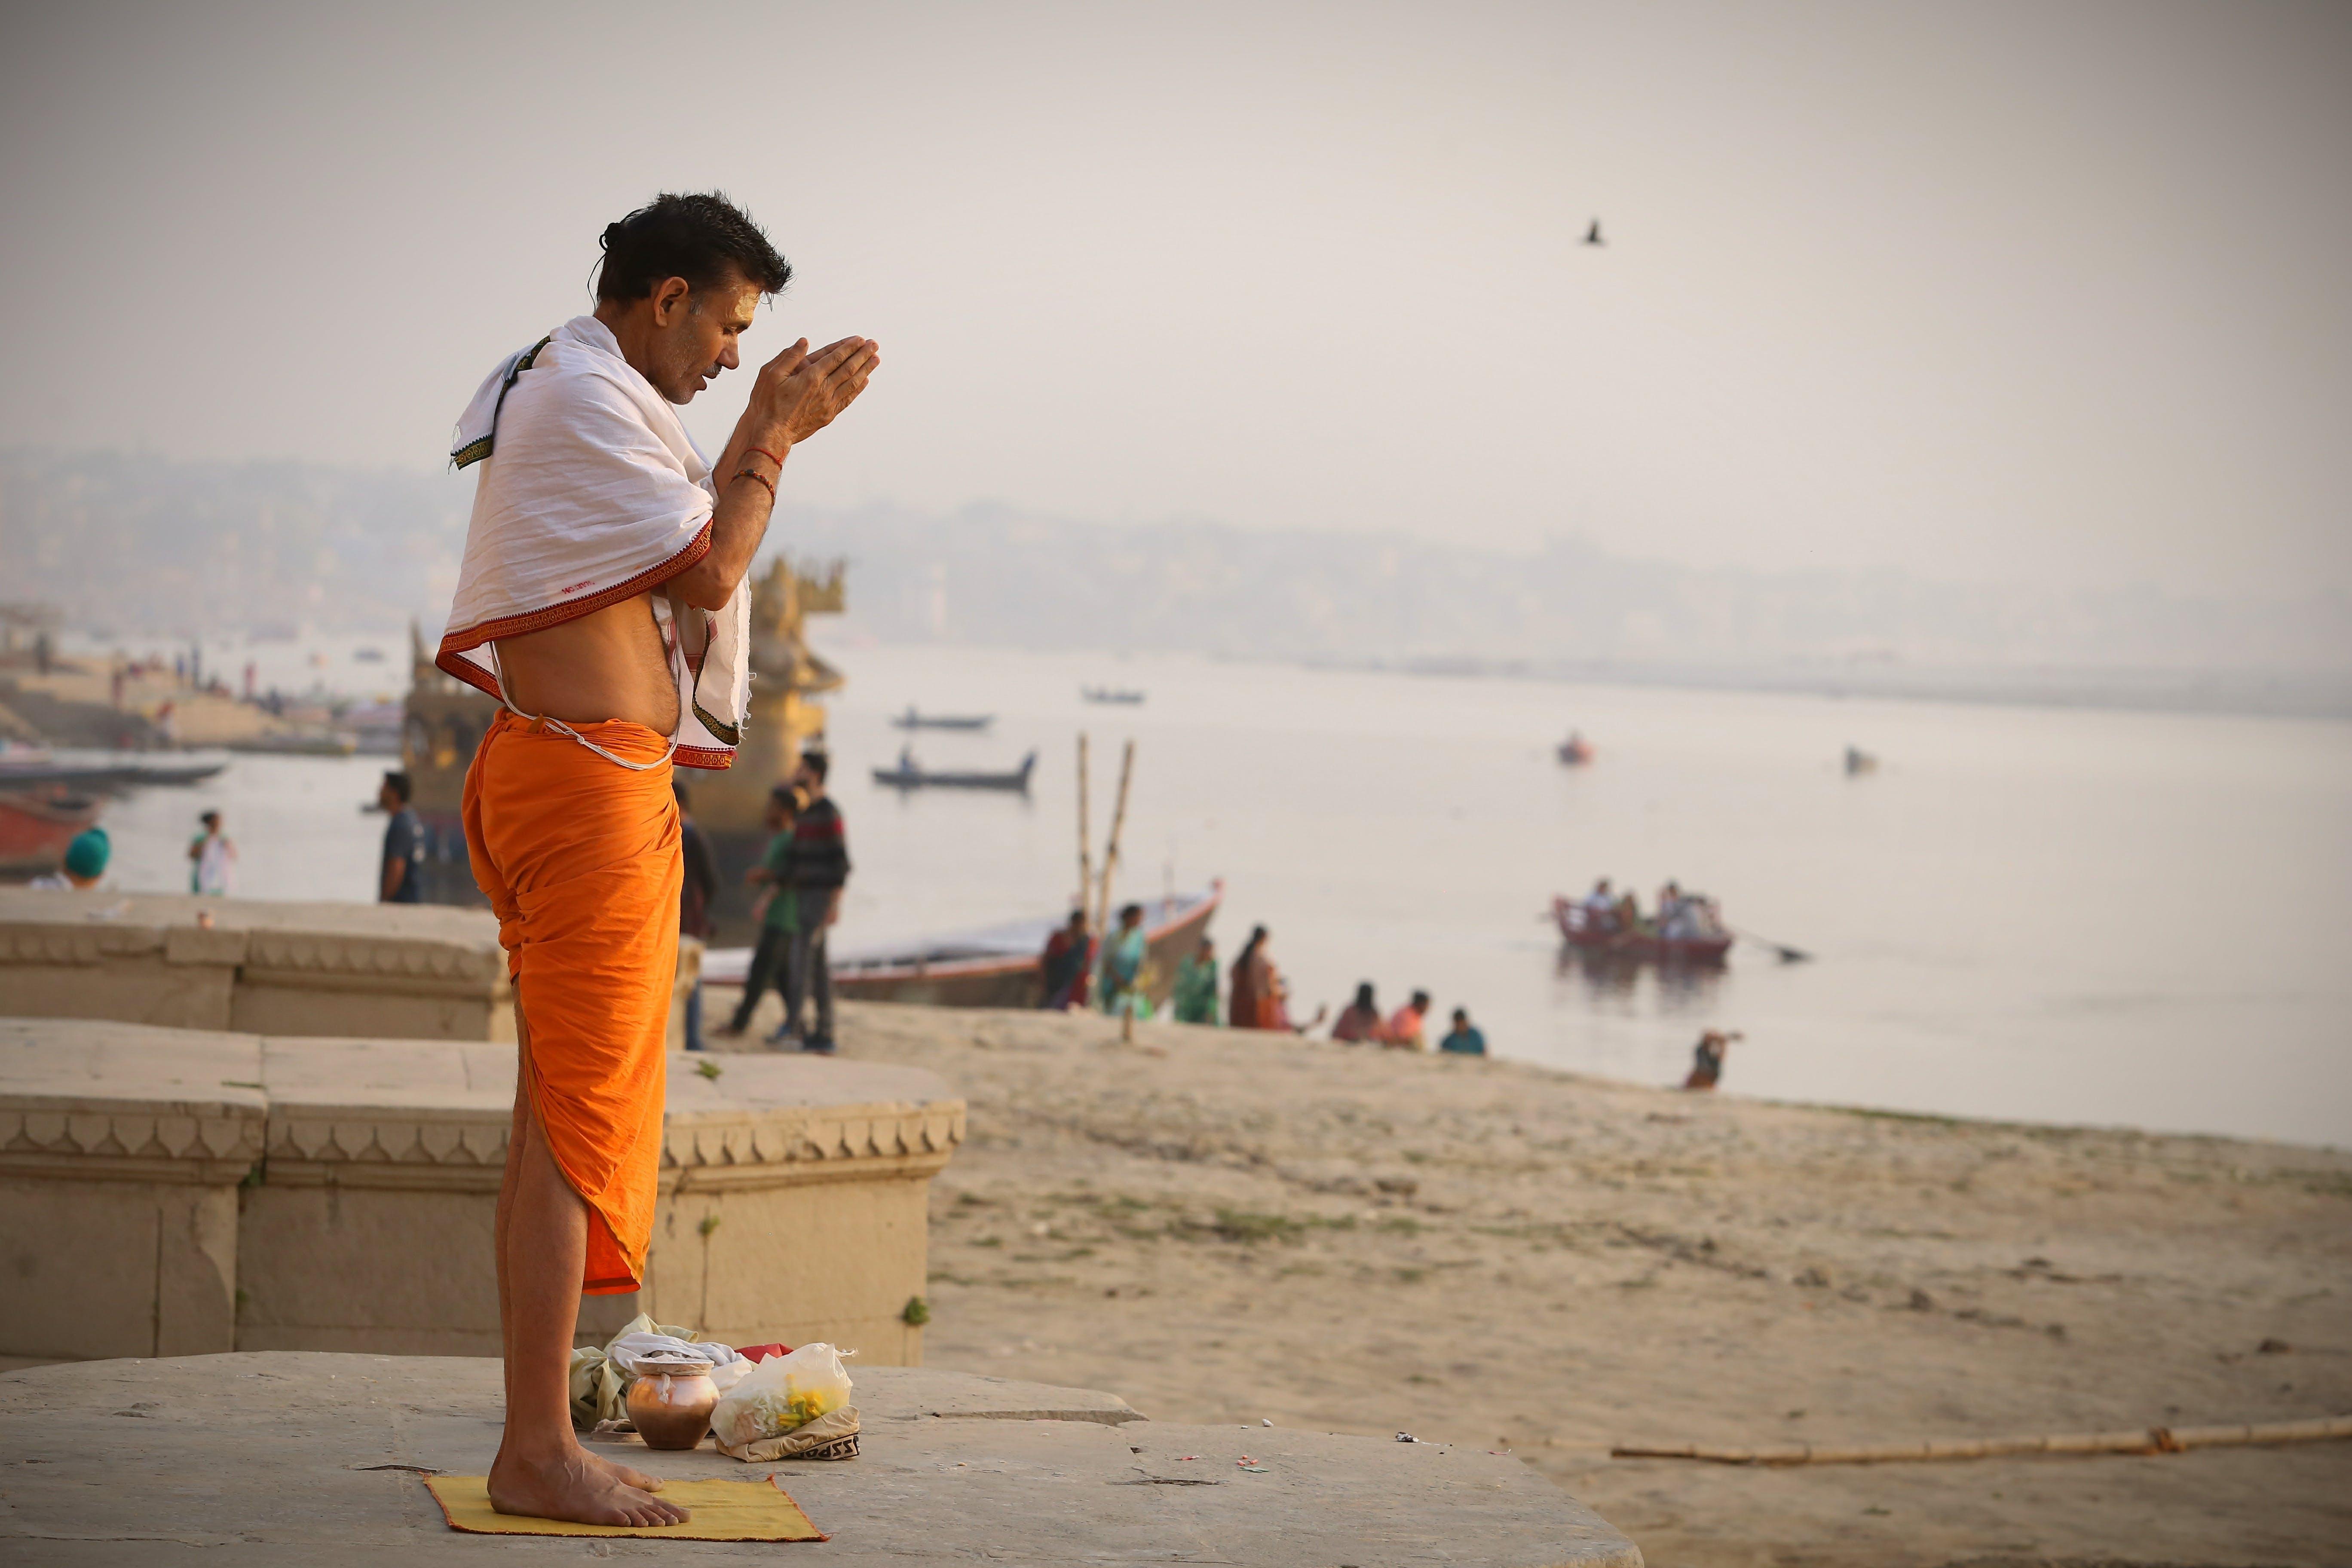 Man Meditating On Seashore